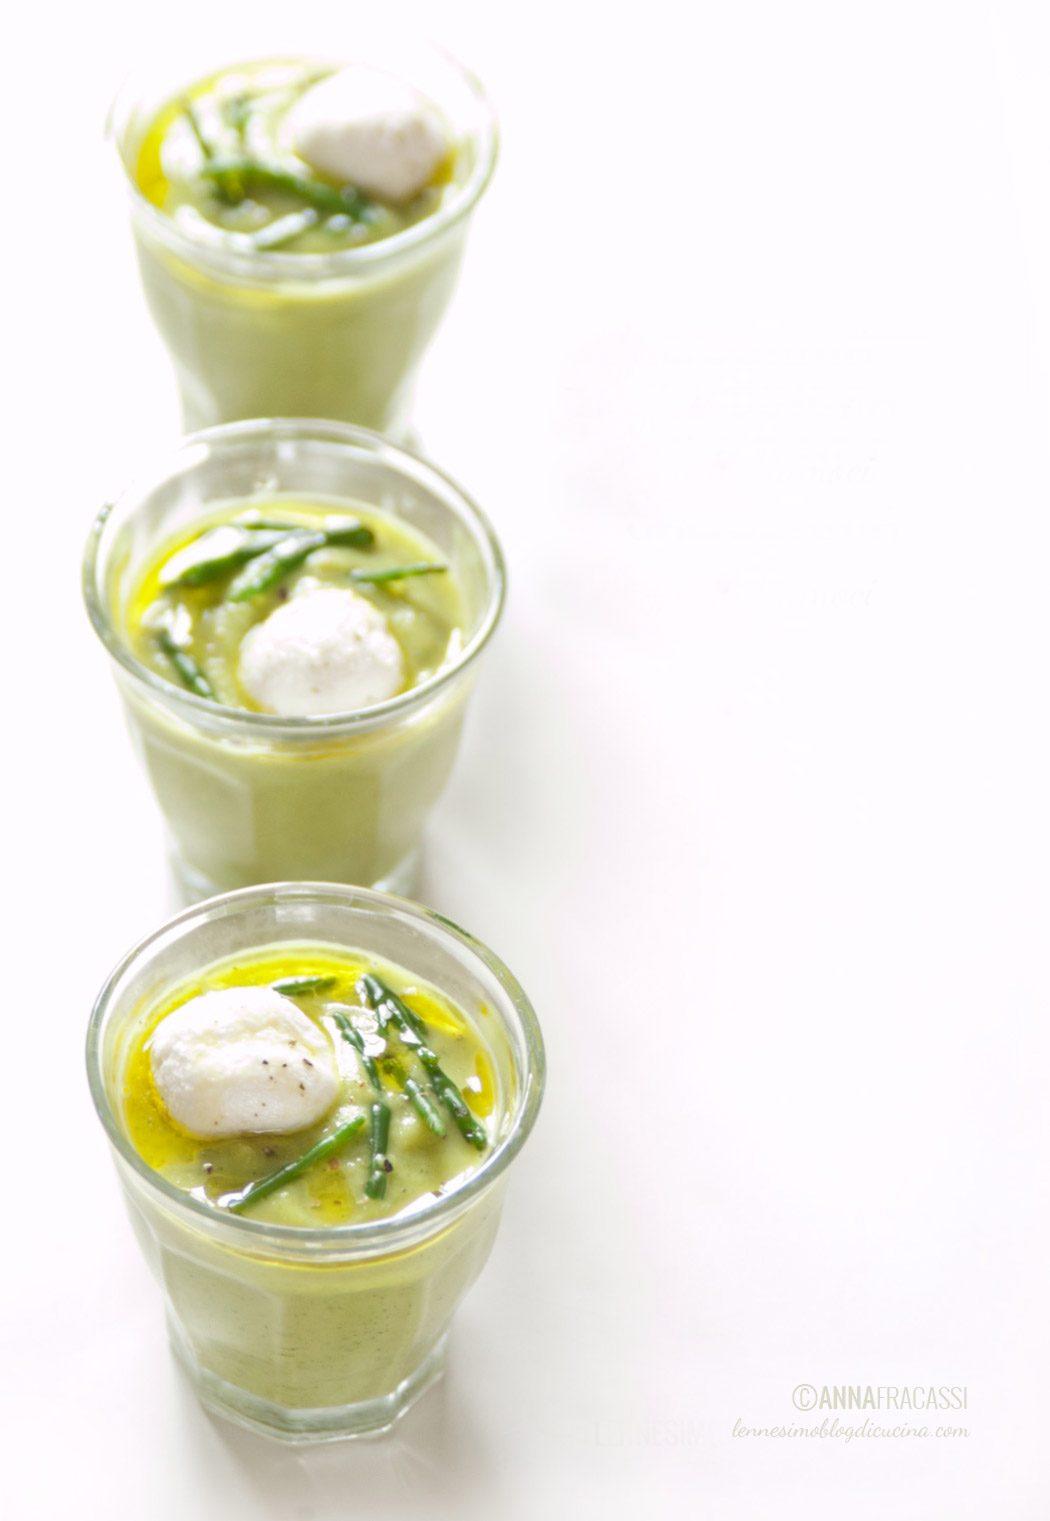 vellutata di zucchine e salicornia